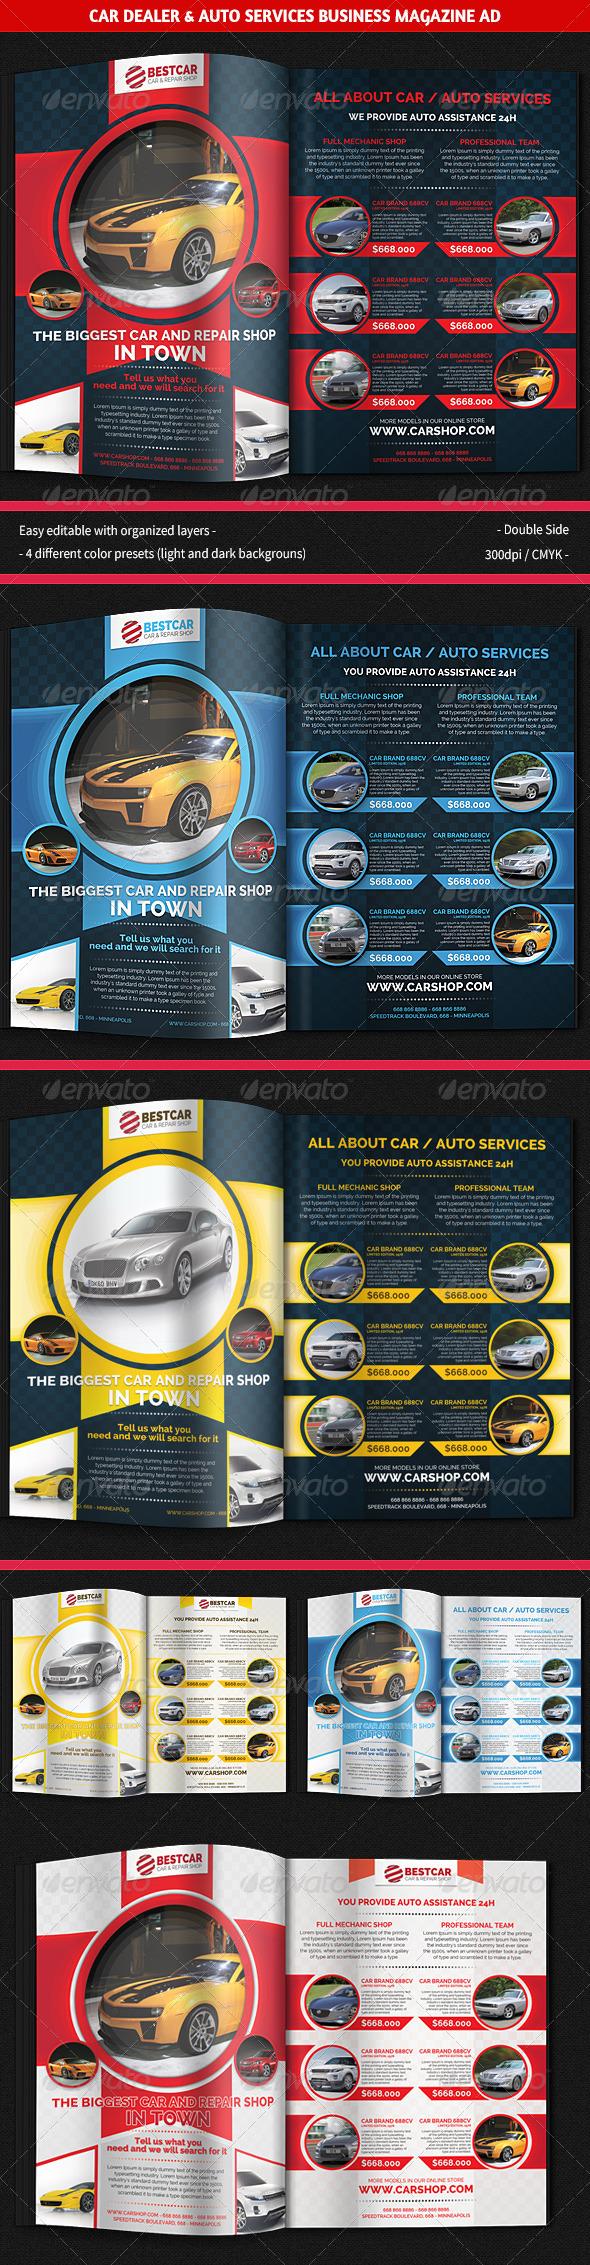 Car Dealer & Auto Services Business Magazine Ad - Magazines Print Templates